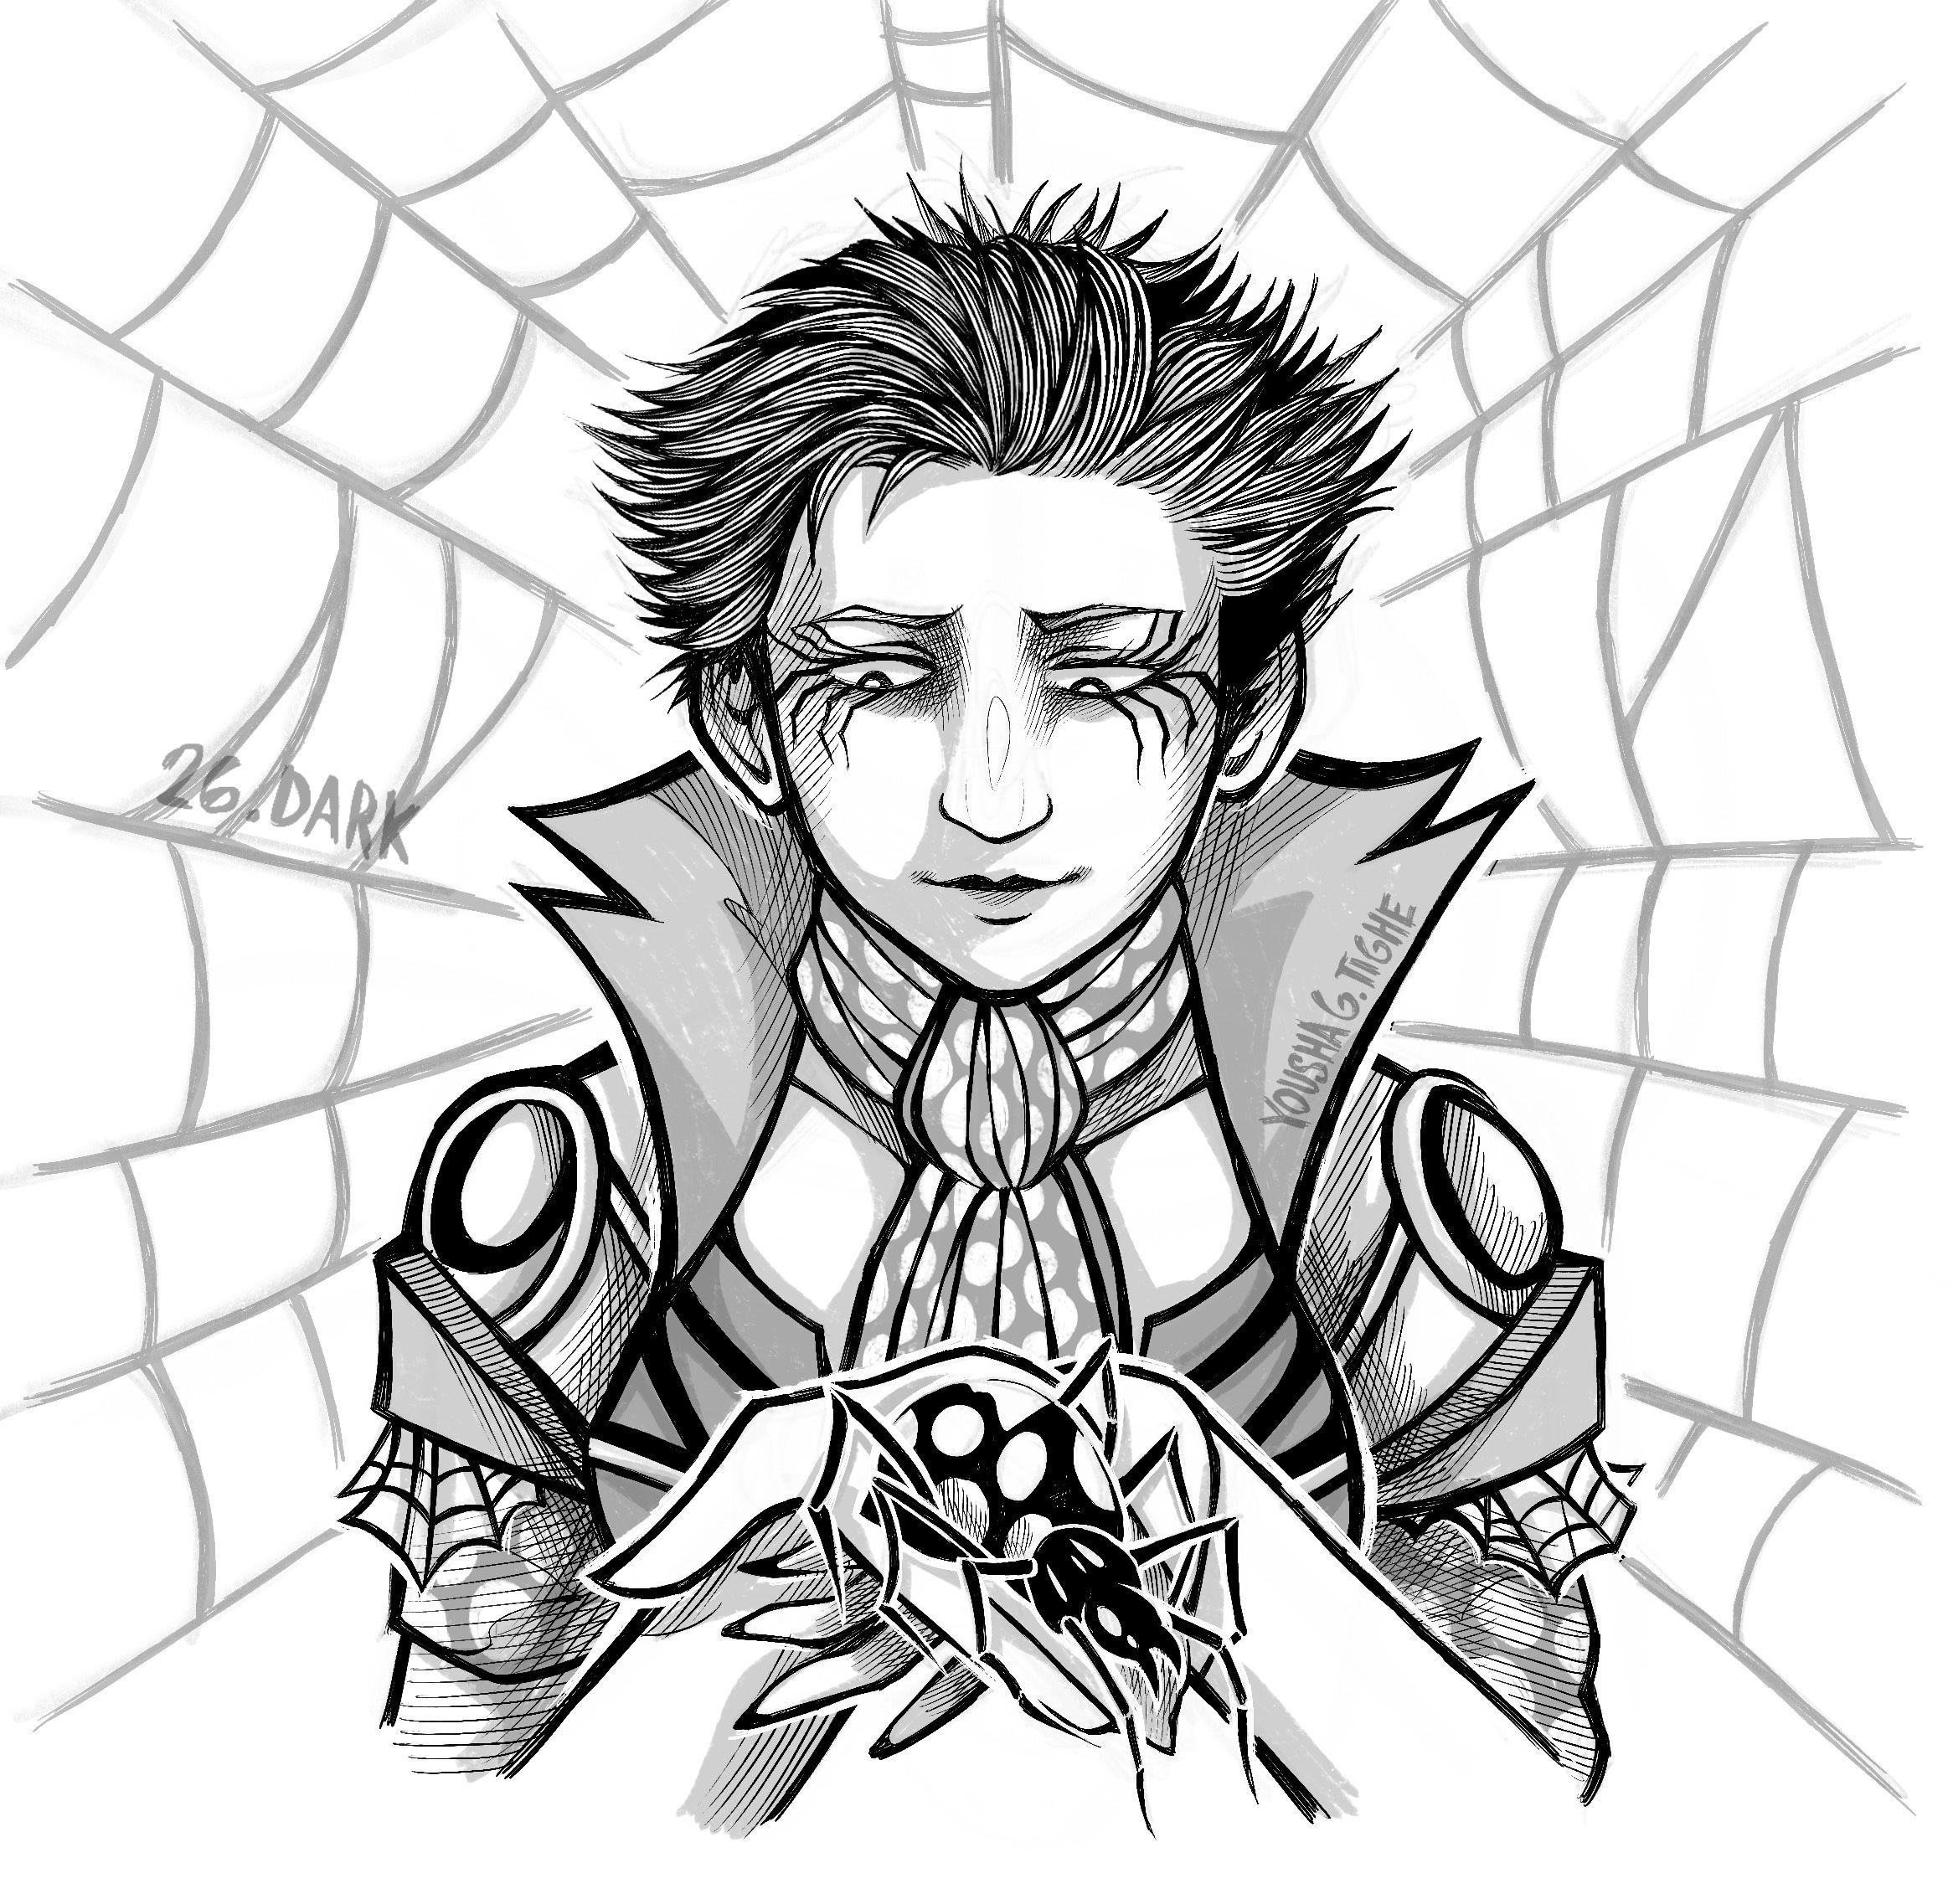 Feat Spider Girl Oc Portia Aranea With Her Precious Spider